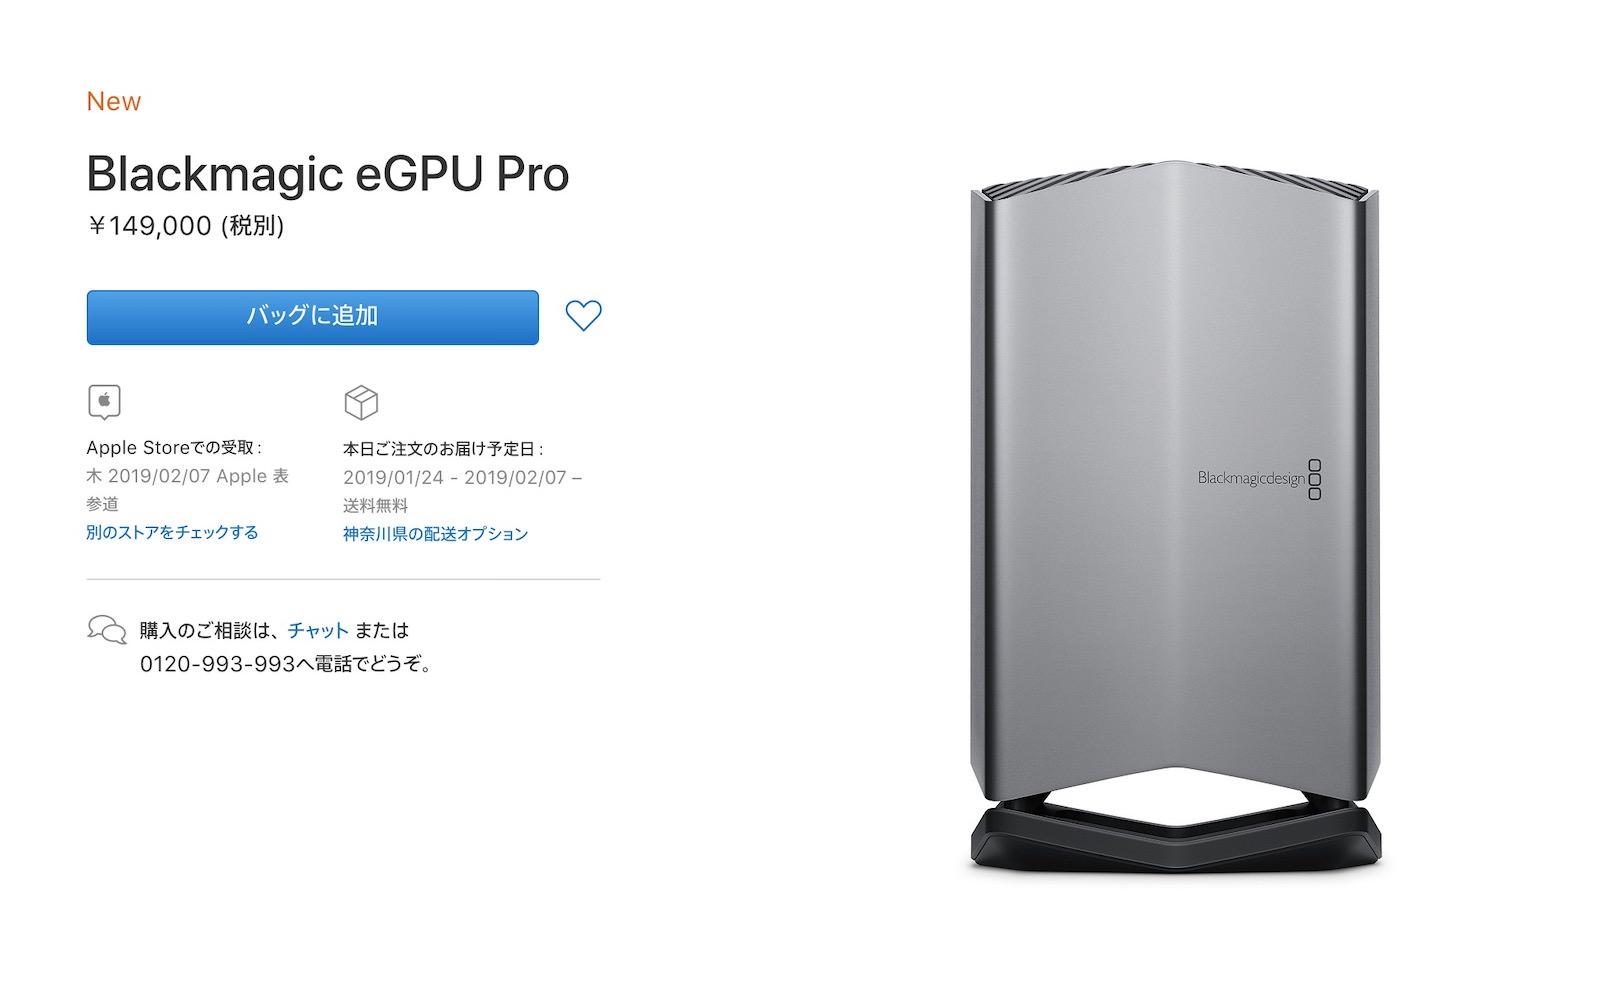 Blackmagic eGPU Pro Now on Sale